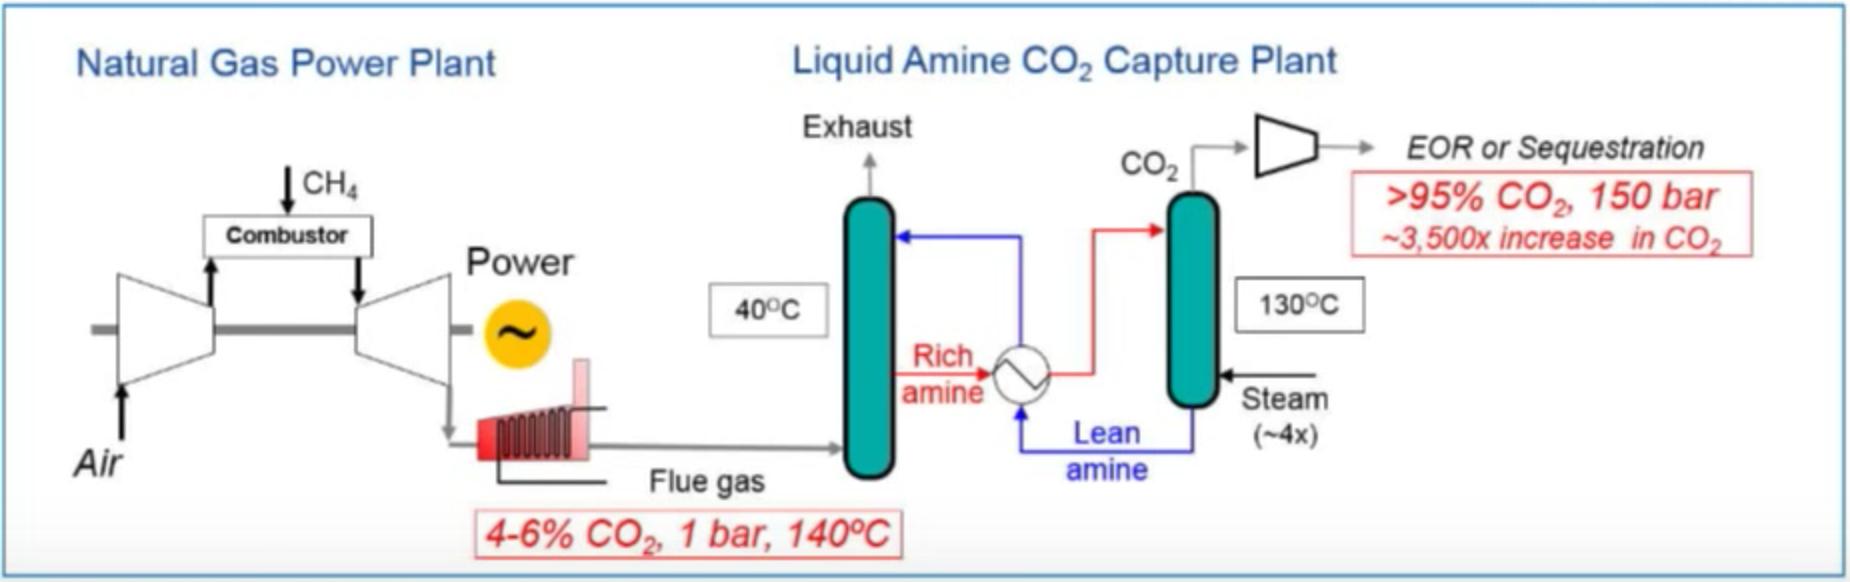 amine CO2 plant